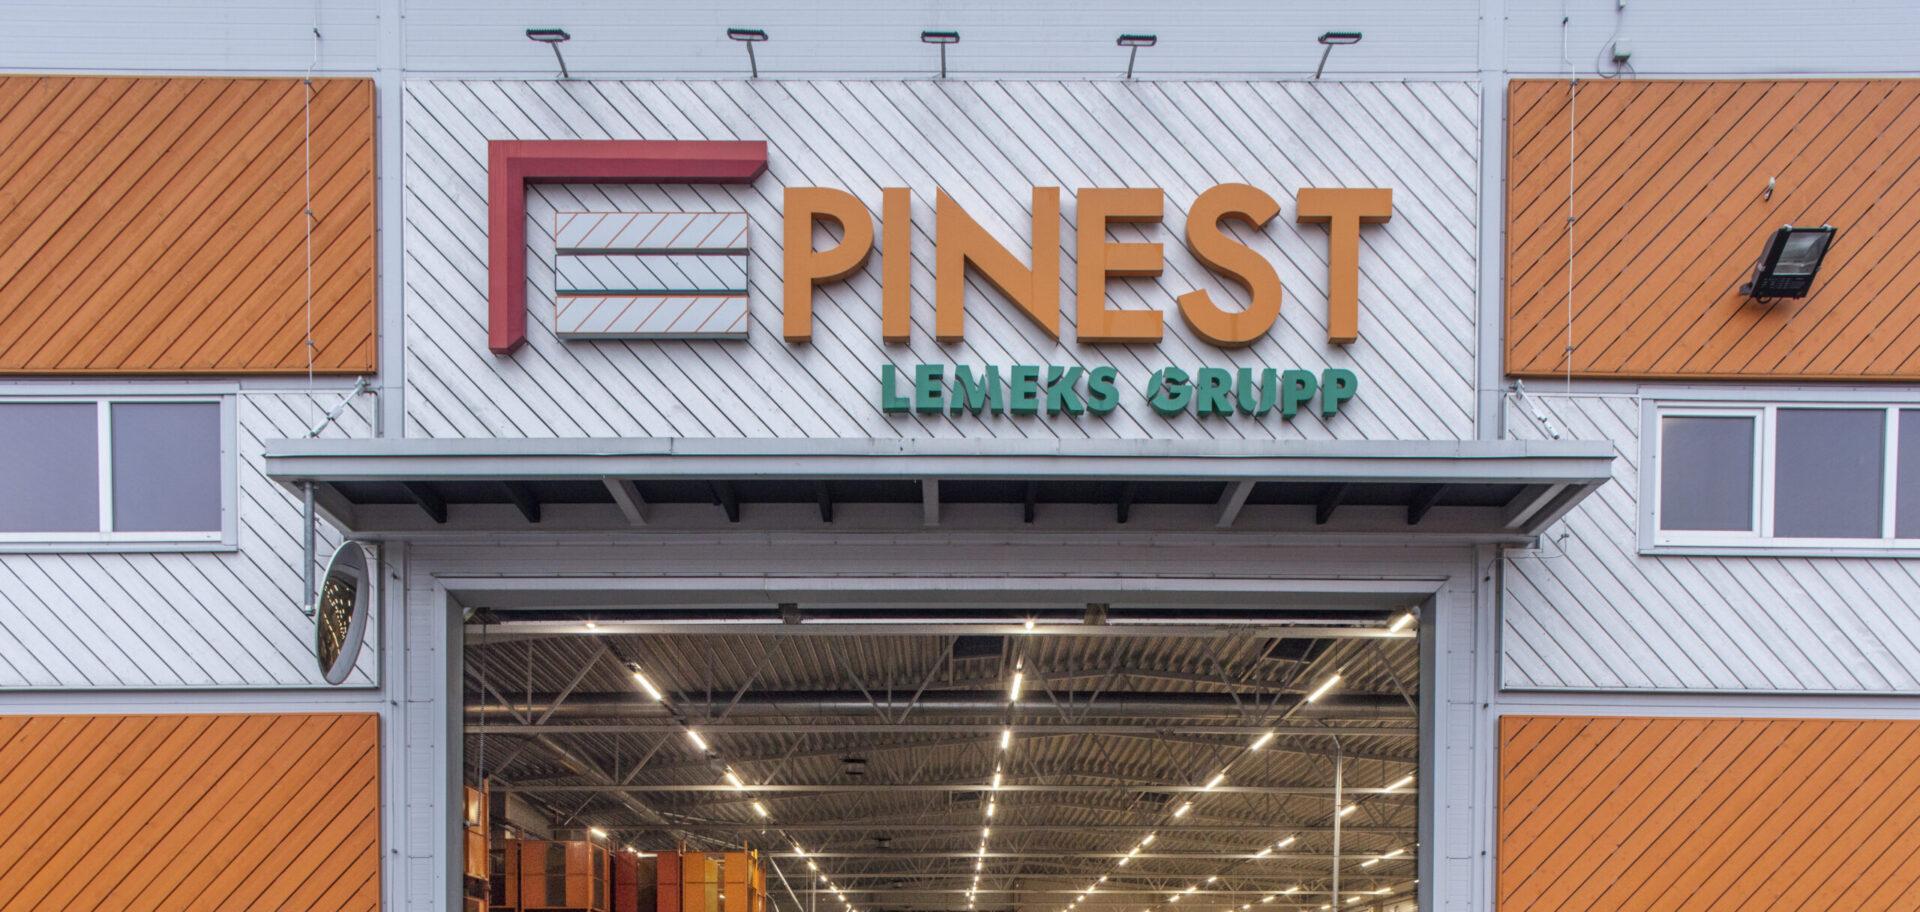 Pinest